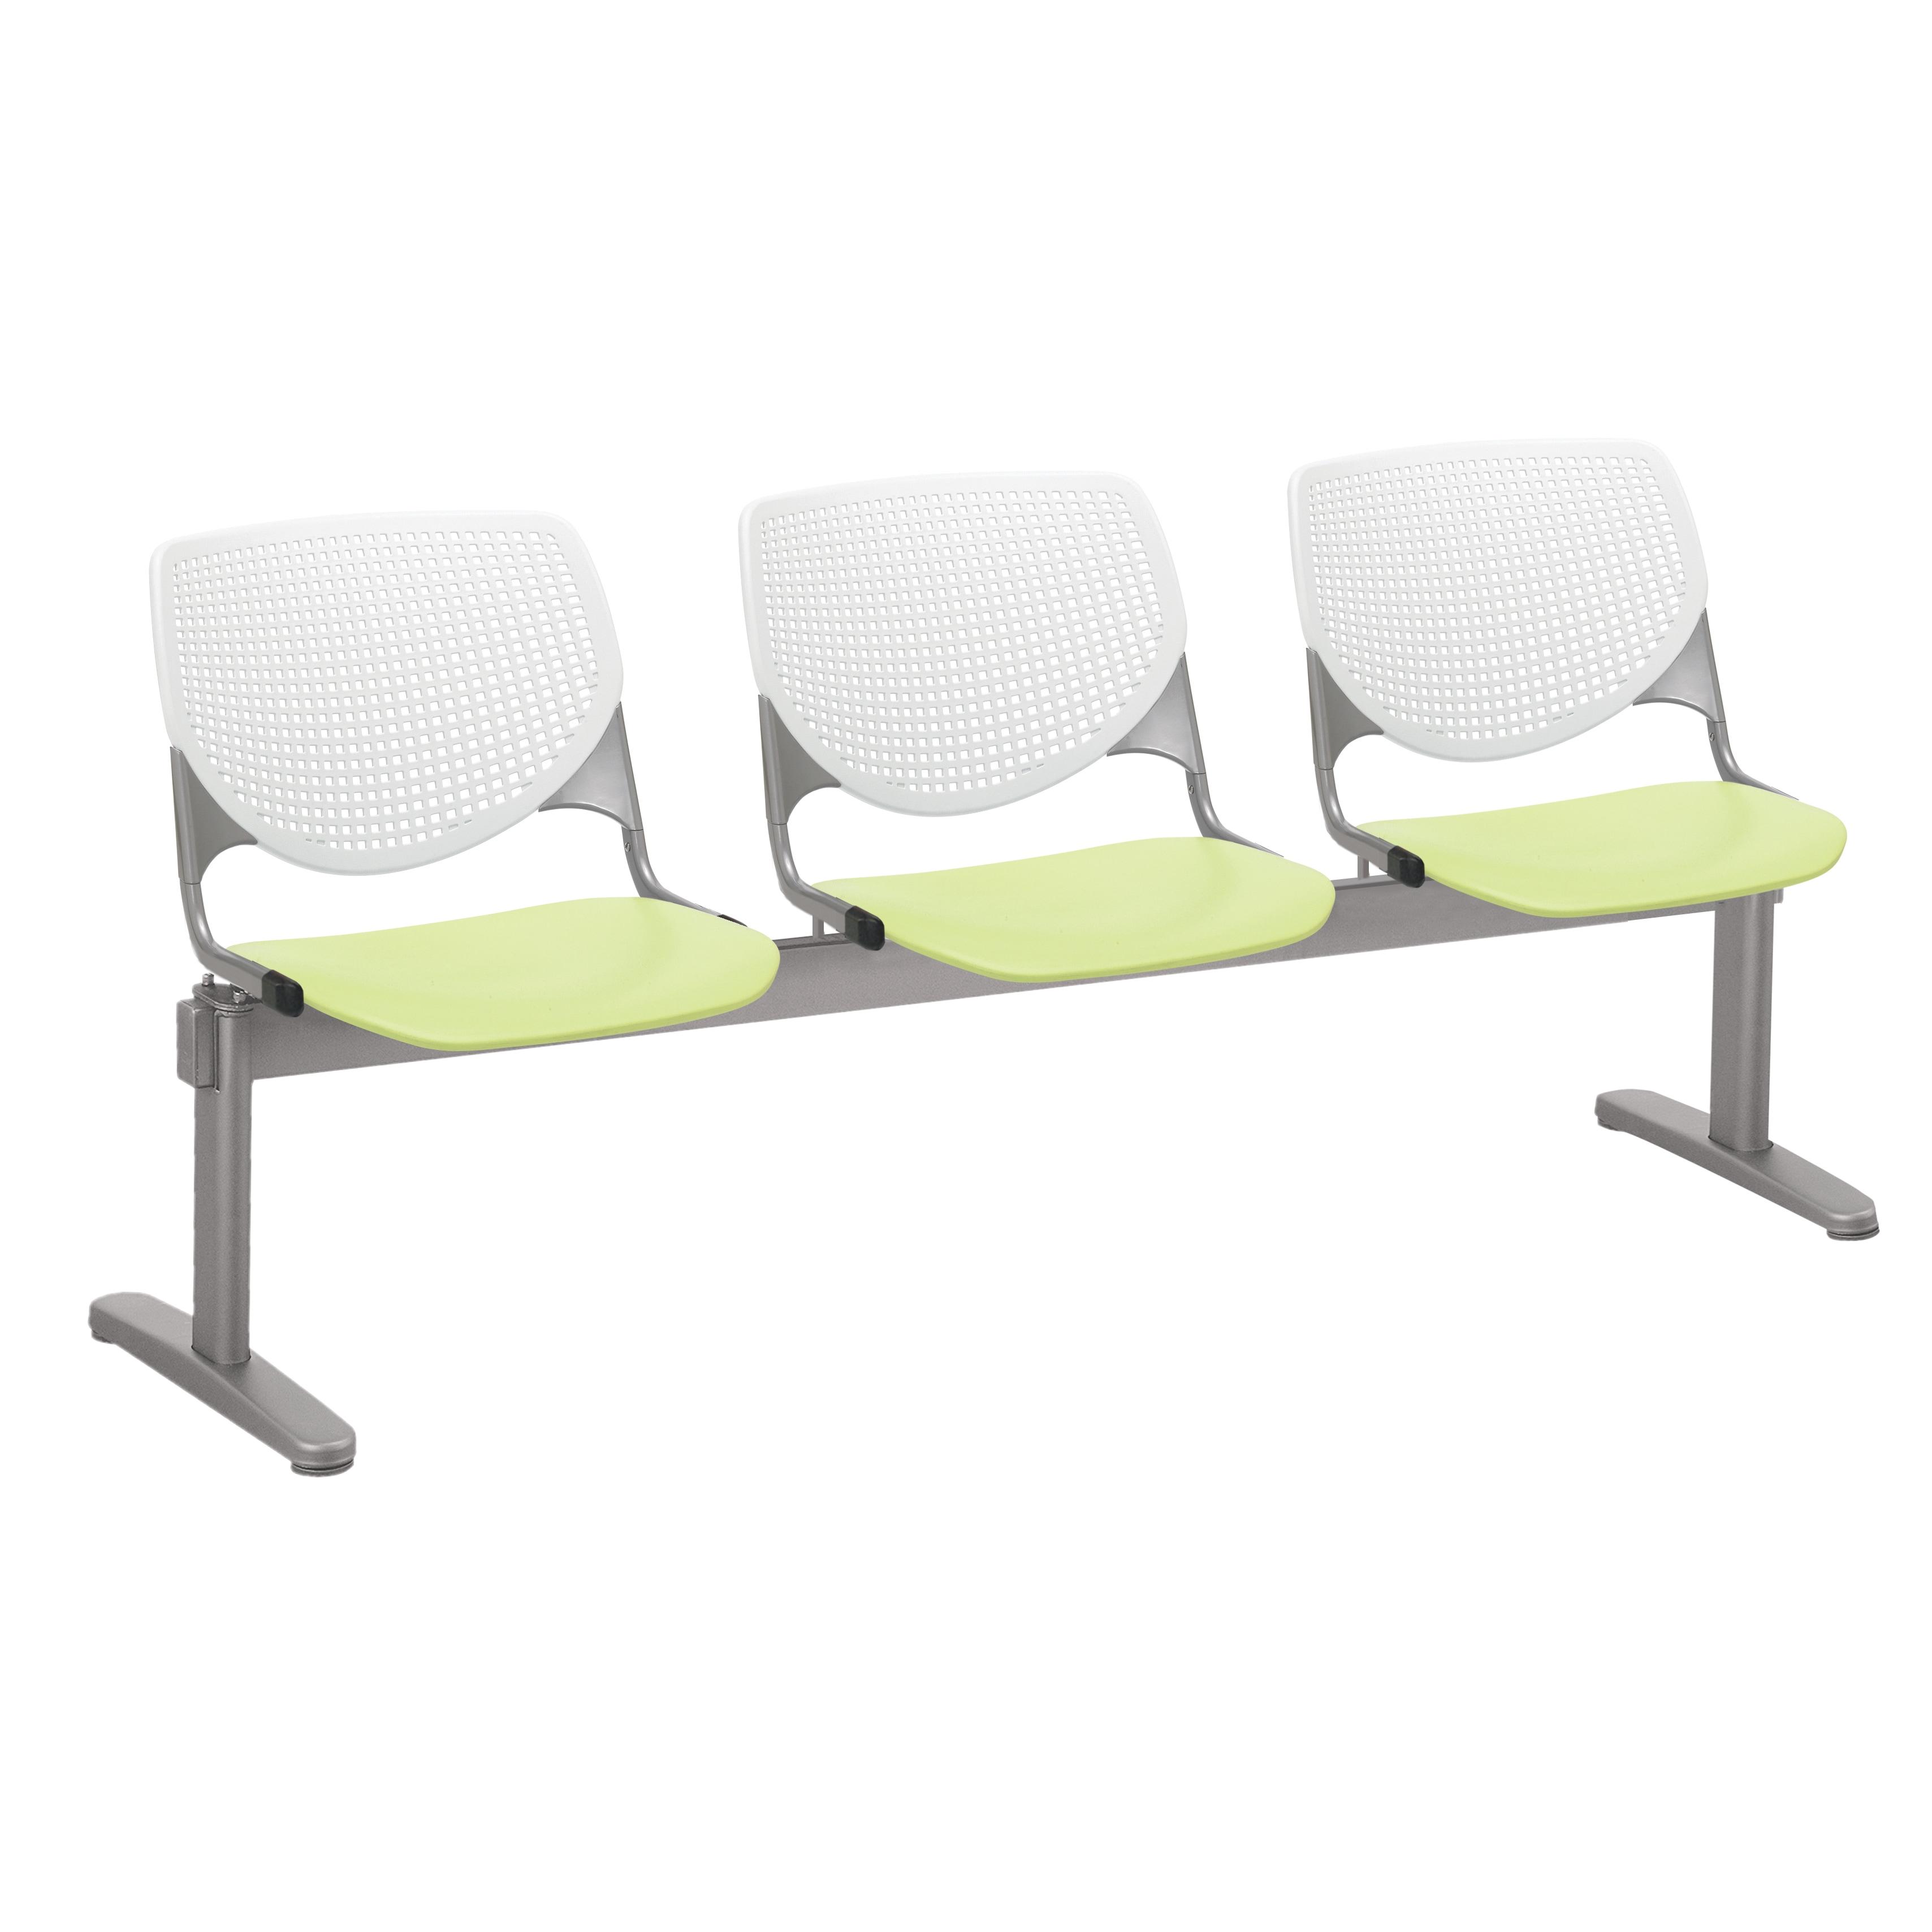 KFI KOOL 50 Seat Waiting Room Chair, White Back, Lime Green Seat - 50 seats